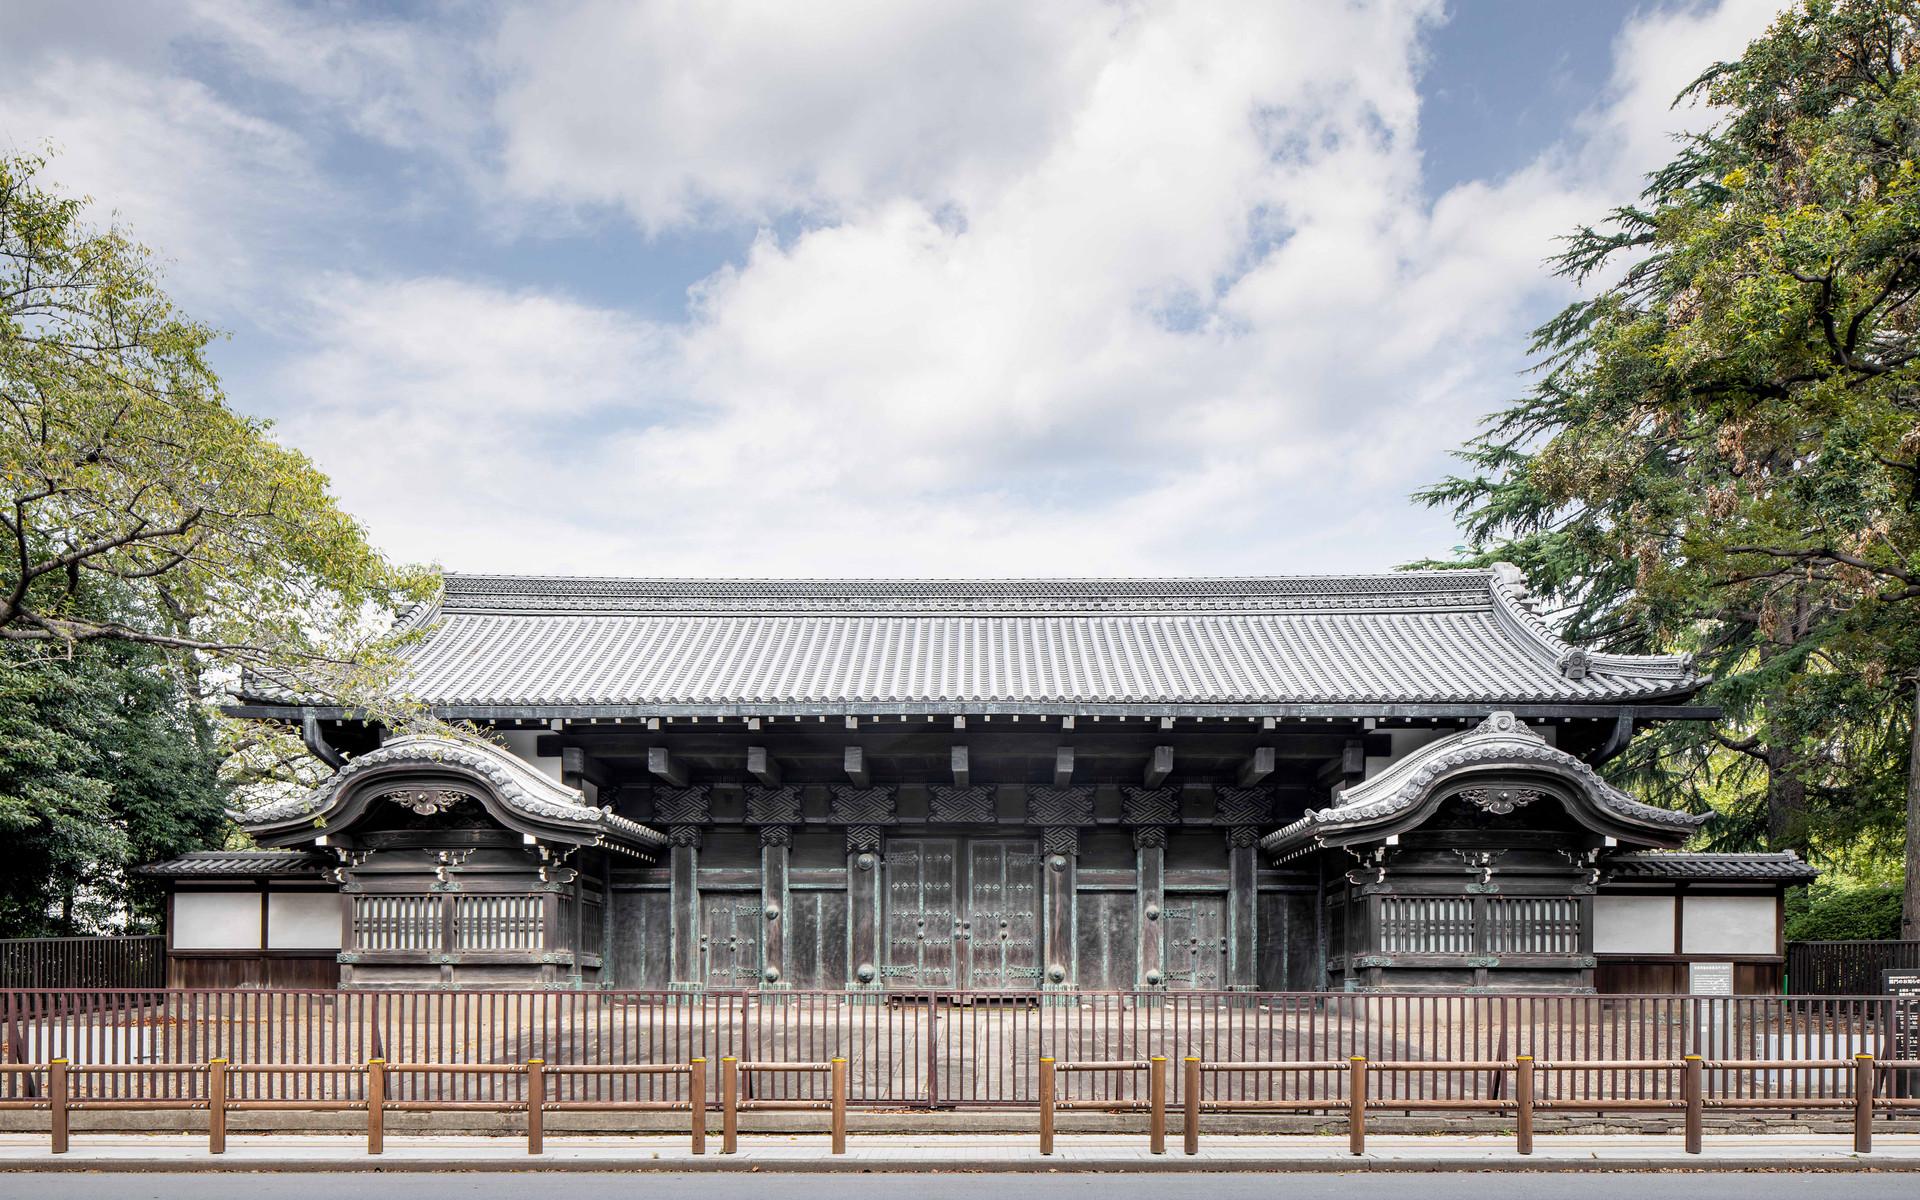 Kuromon Gate of the Inshu-Ikeda Residence, Tokyo